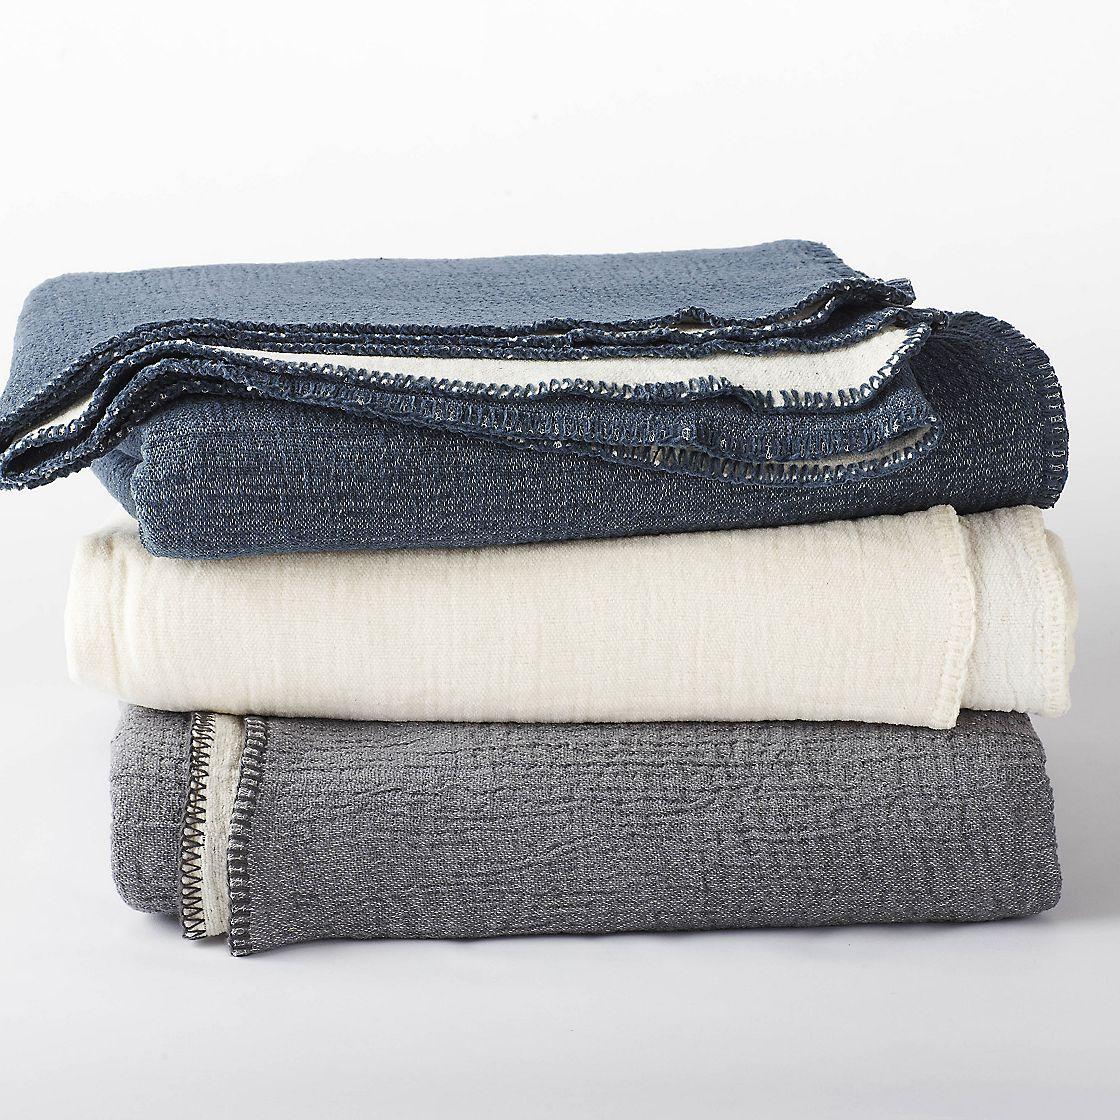 Coyuchi Cozy Cotton Blanket And Throw The Company Store Organic Blankets Cotton Blankets Organic Cotton Blanket